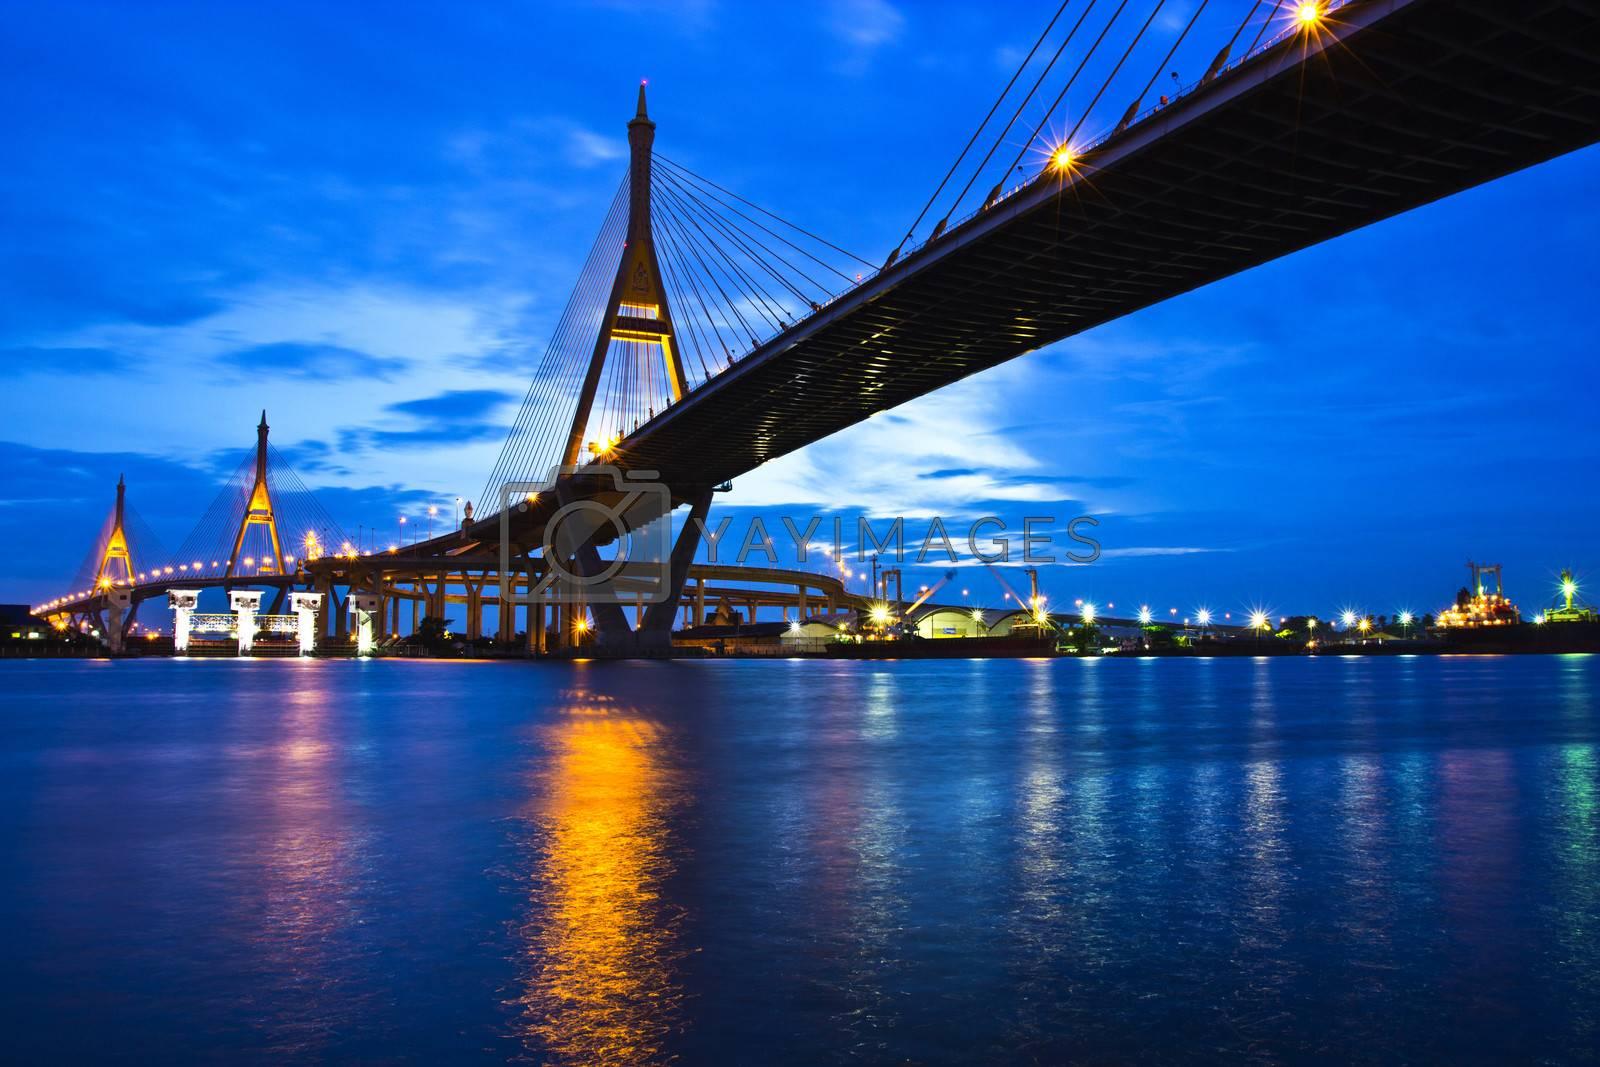 Bhumibol Bridge 1 and Bhumibol Bridge 2 in Bangkok of Thailand